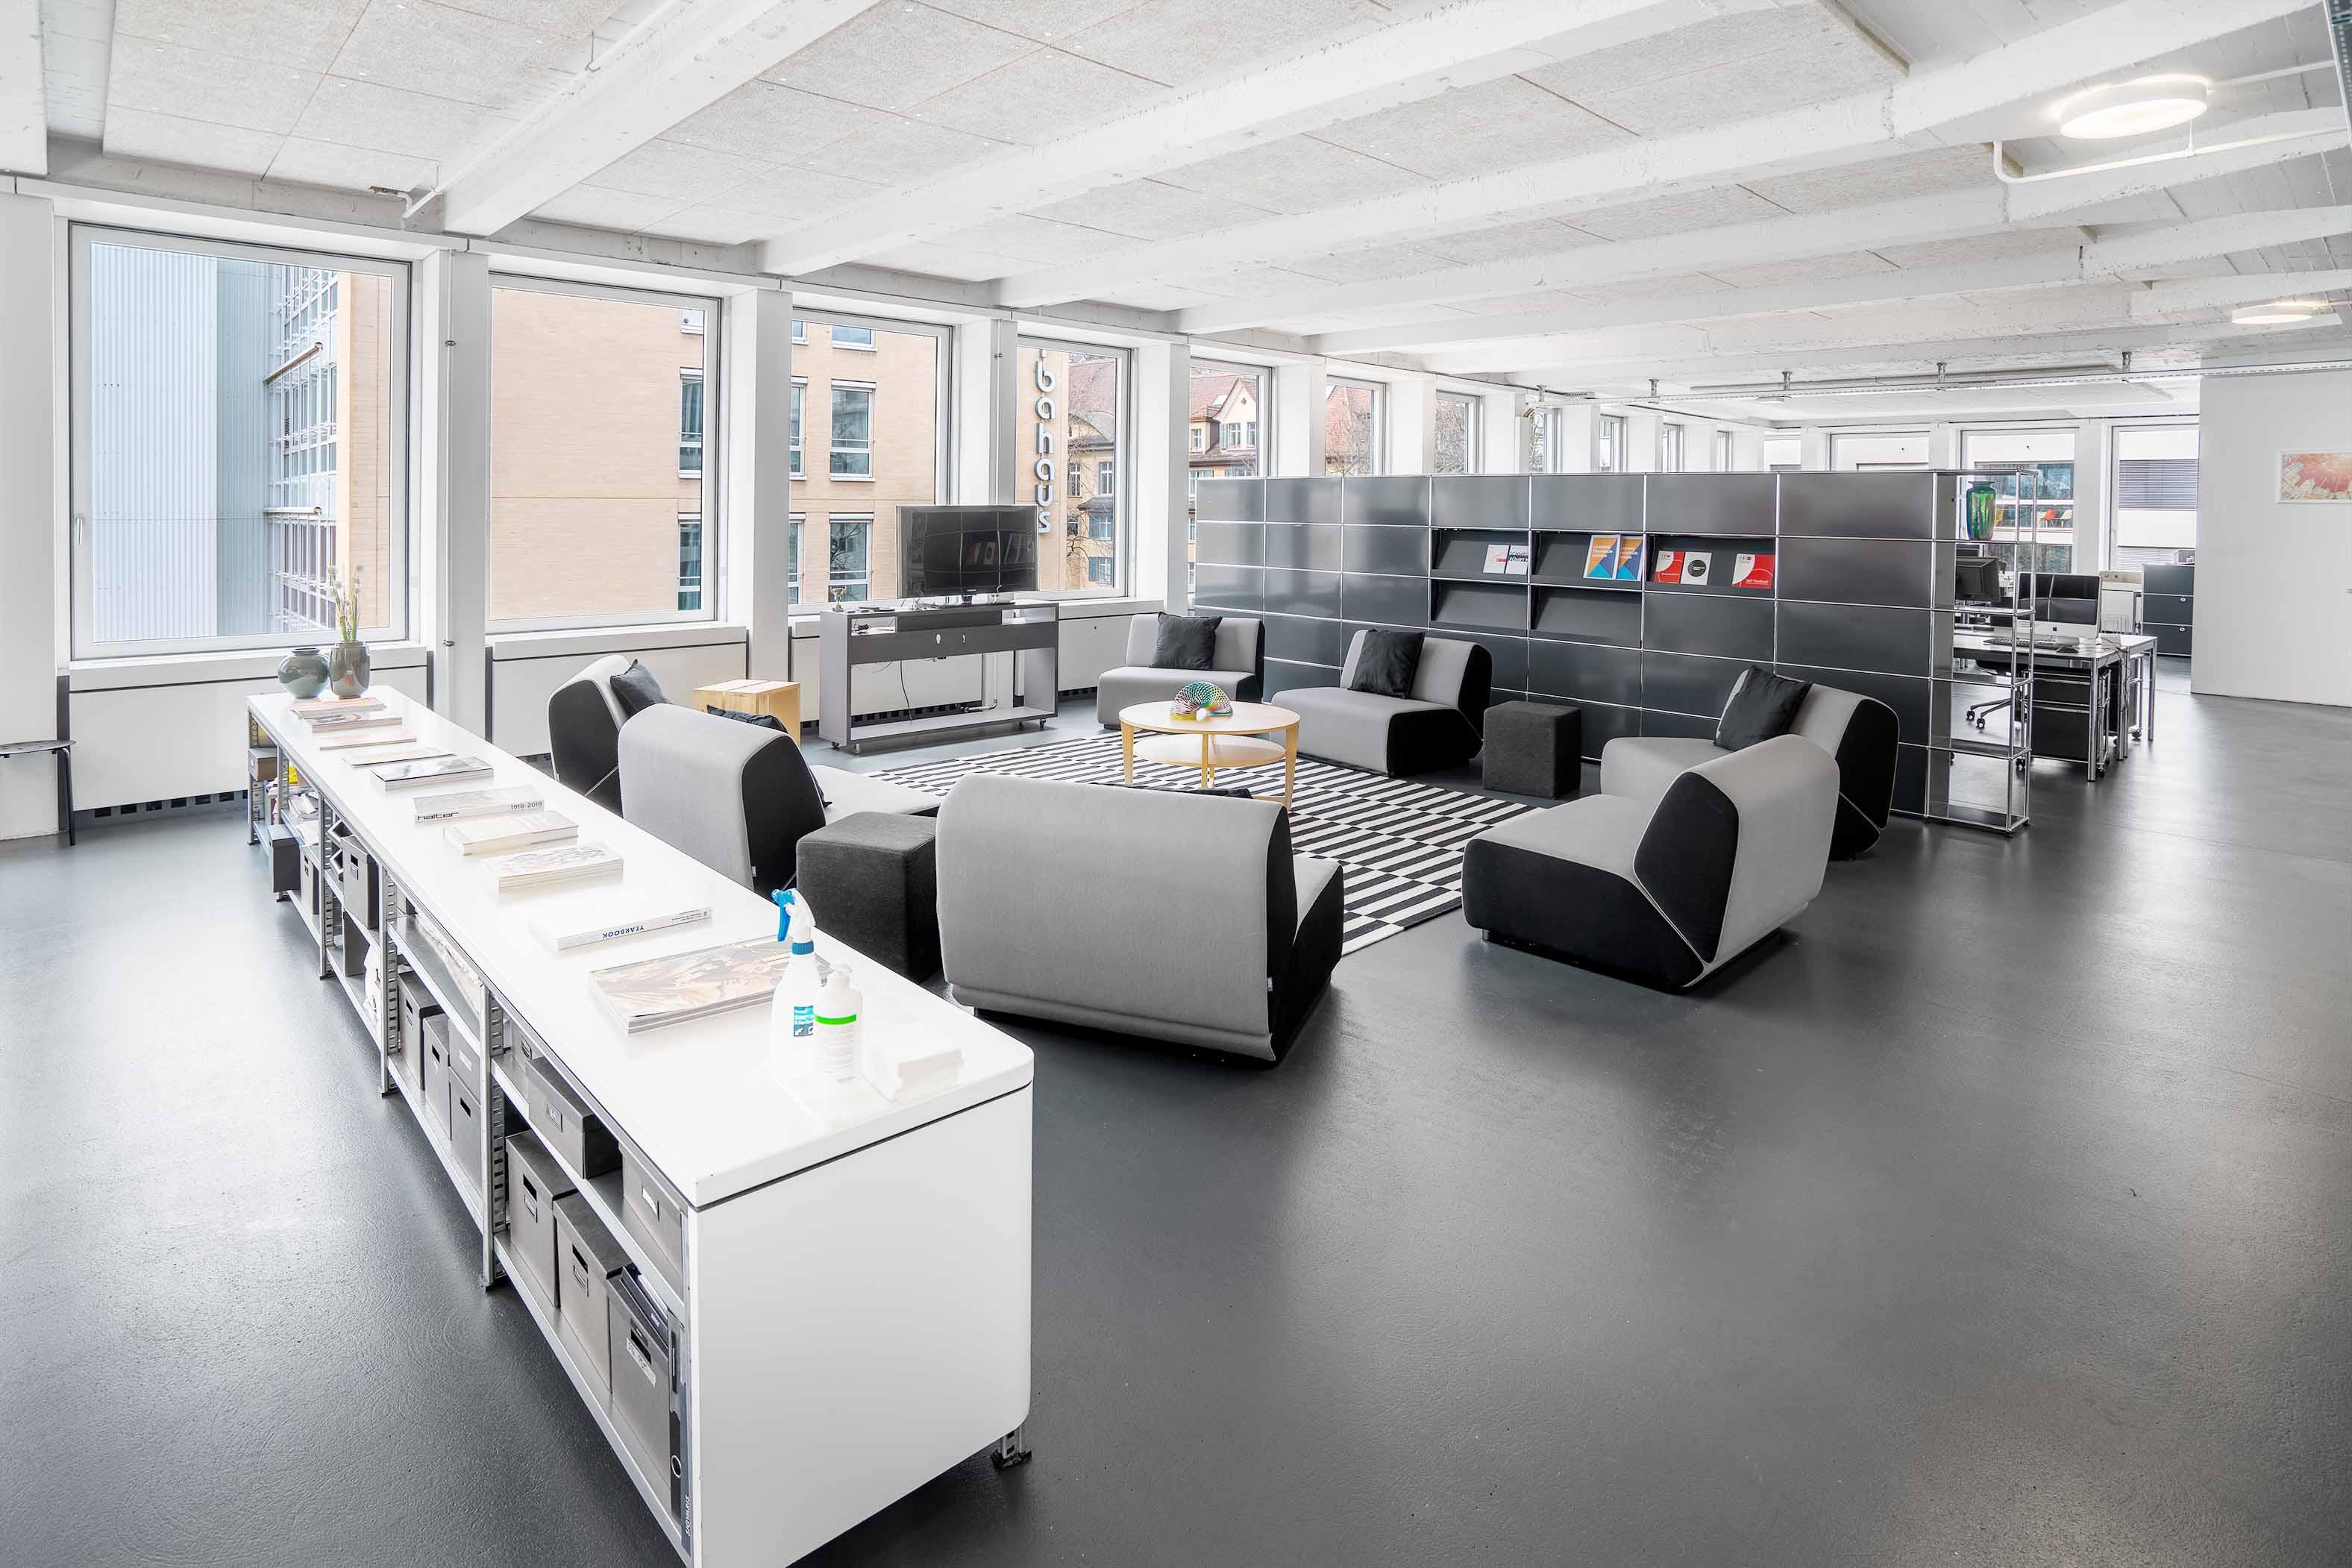 community space, gemeinschaftsraum büro mieten zürich, grossraum office, puls 5 arbeitsplätze, vermieten untermieten und mieten